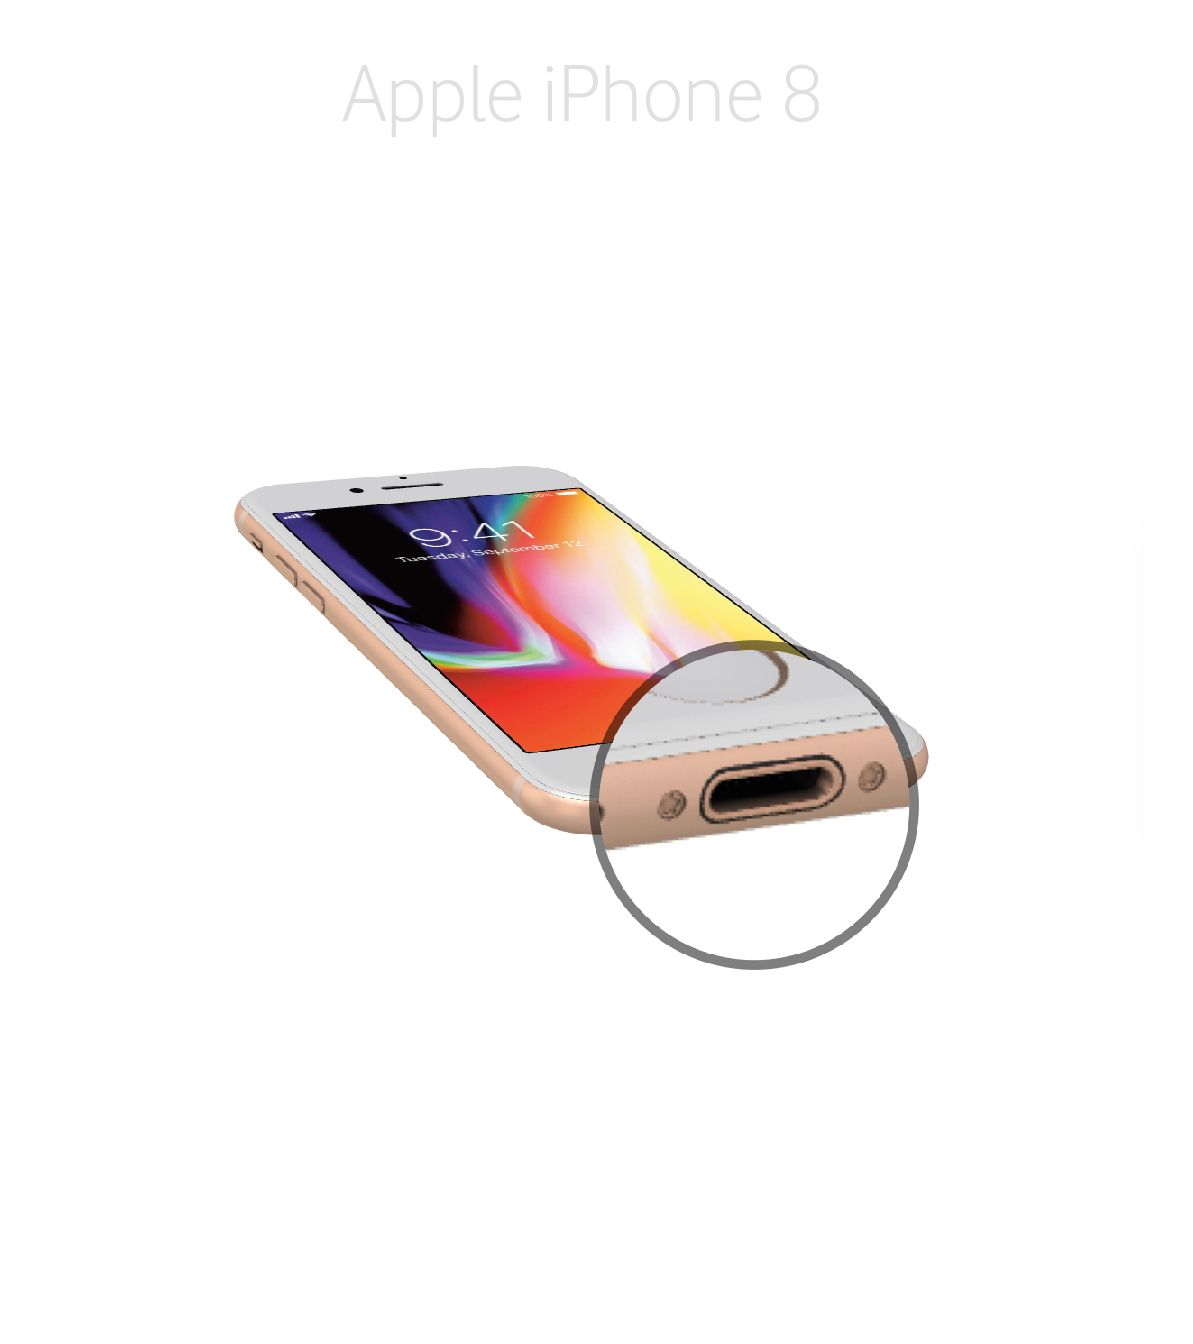 Laga lightningkontakt iPhone 8